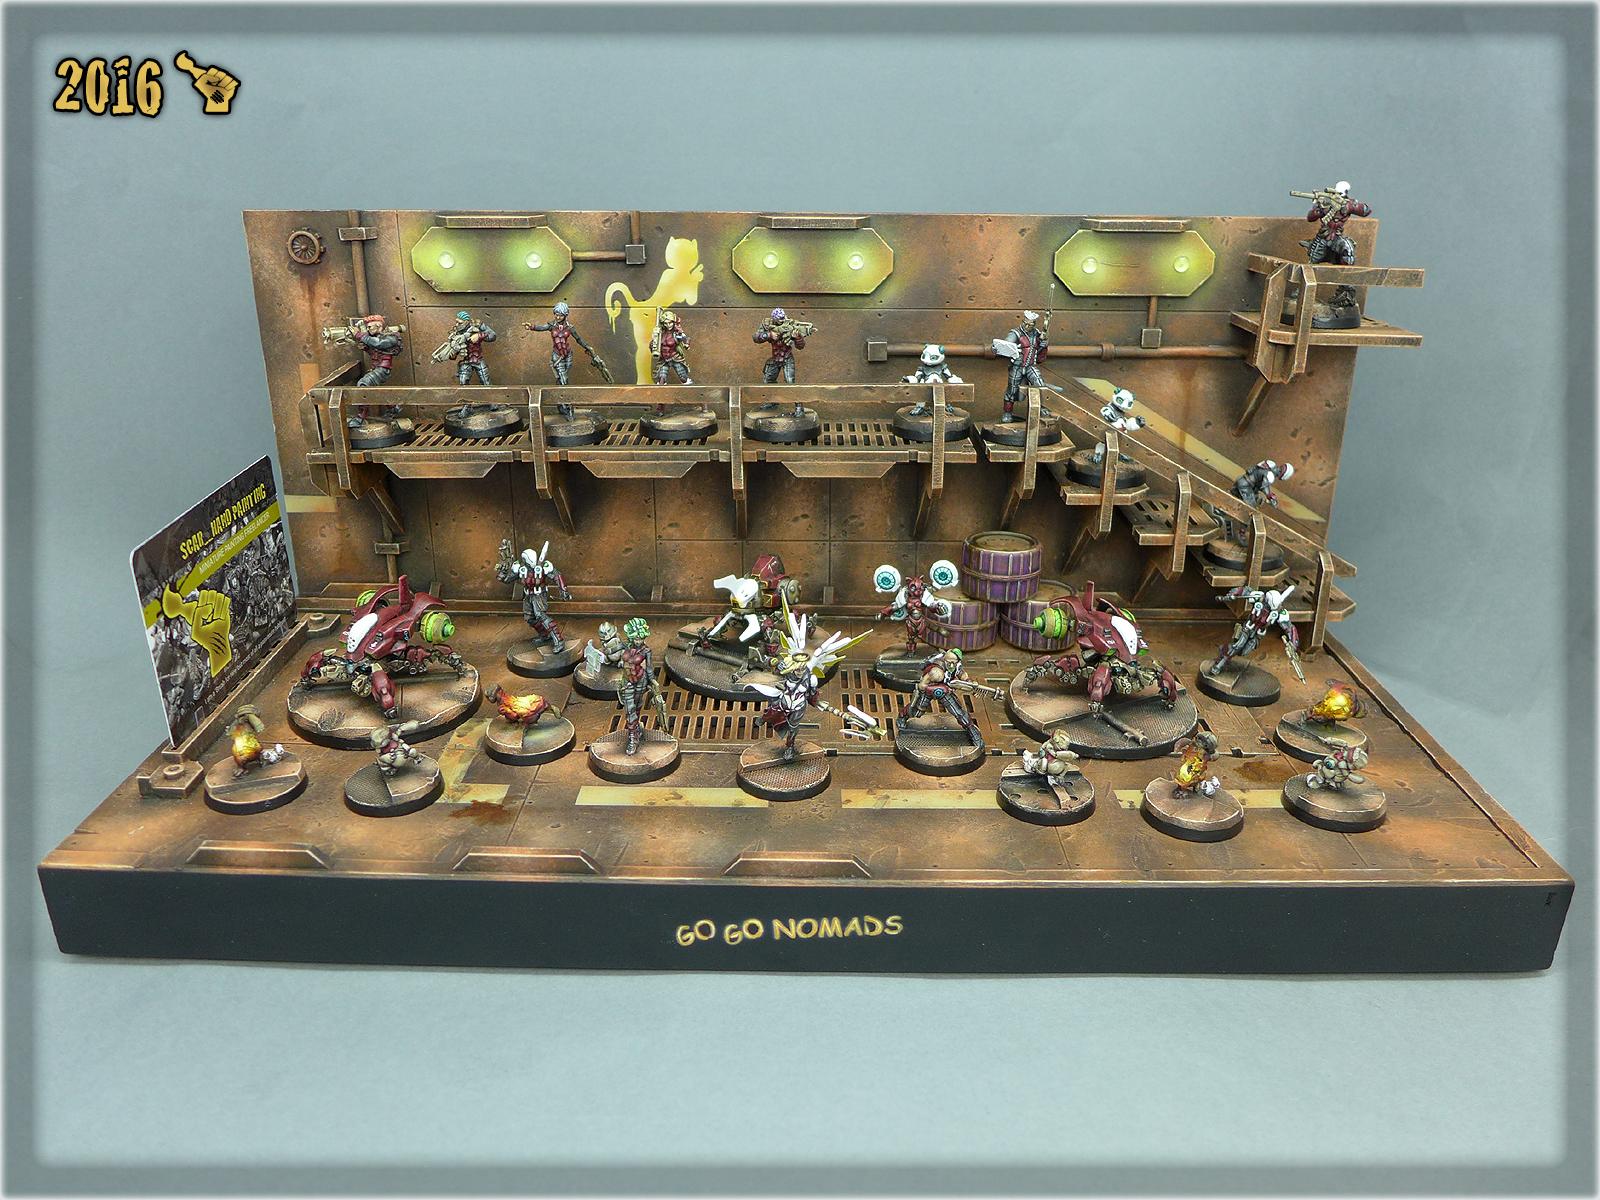 Corregidor GO GO NOMADS Force on a Diorama Display